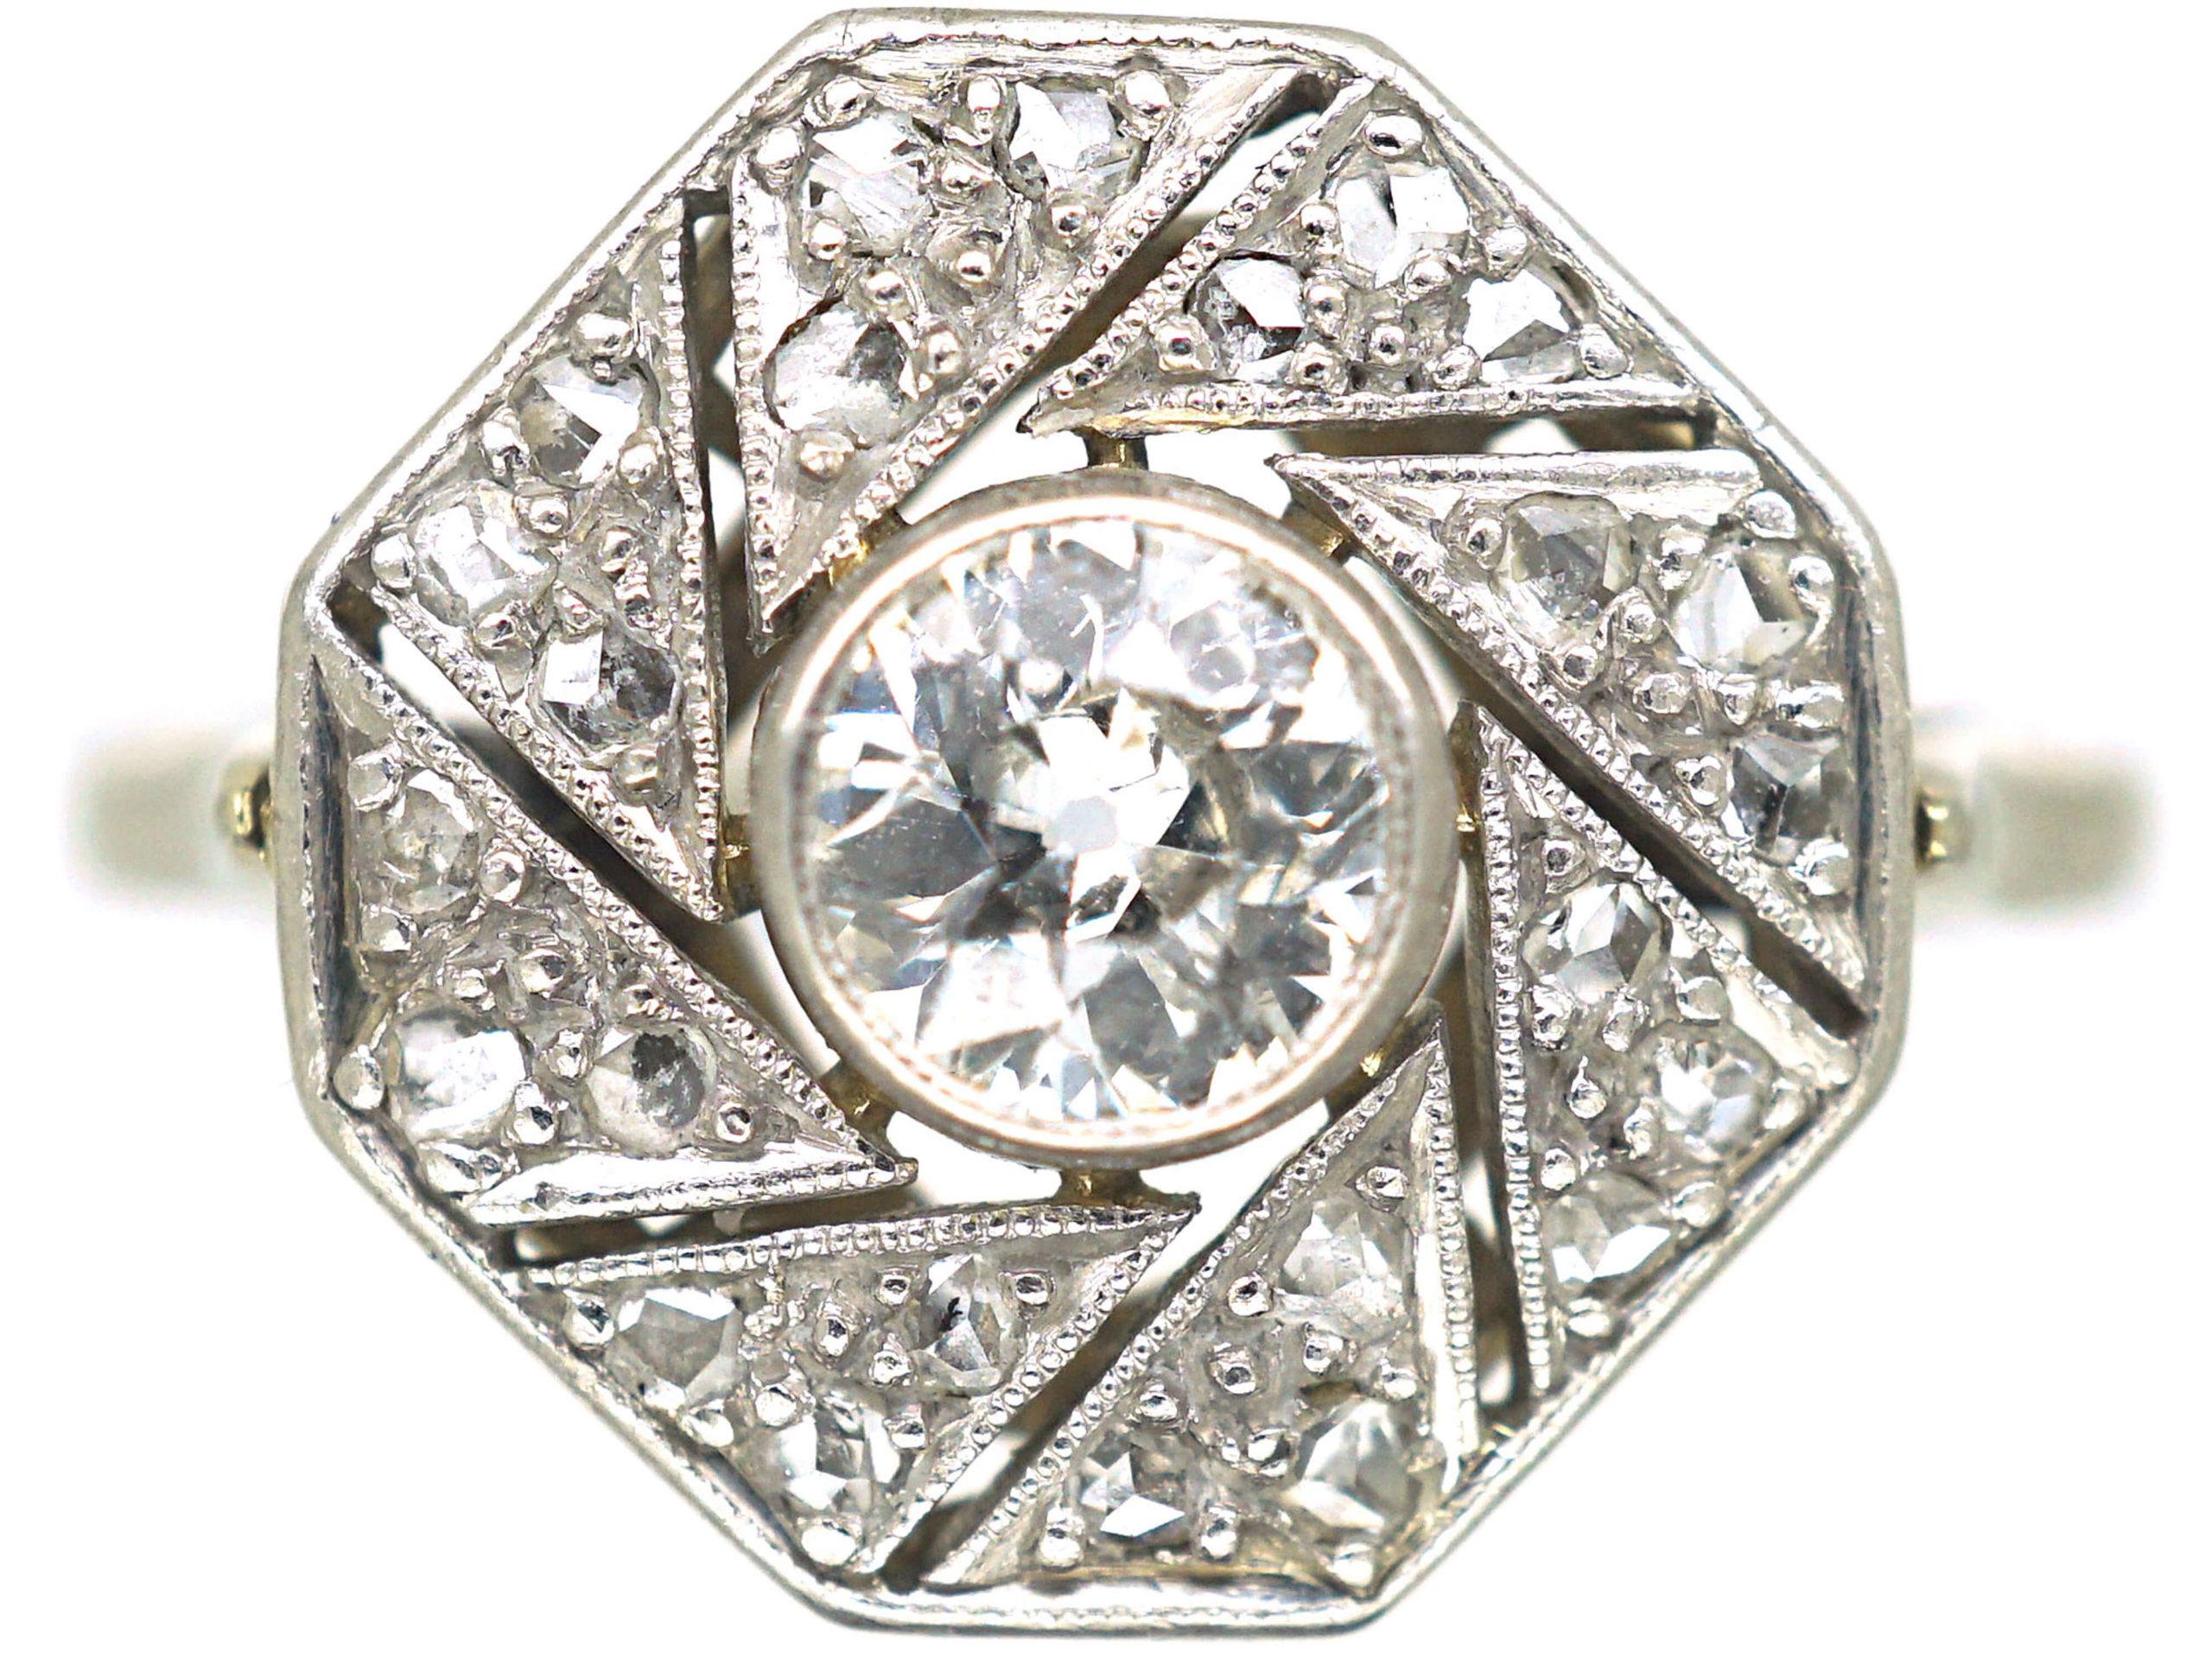 French Art Deco 18ct White Gold and Platinum, Diamond Catherine Wheel Design Ring